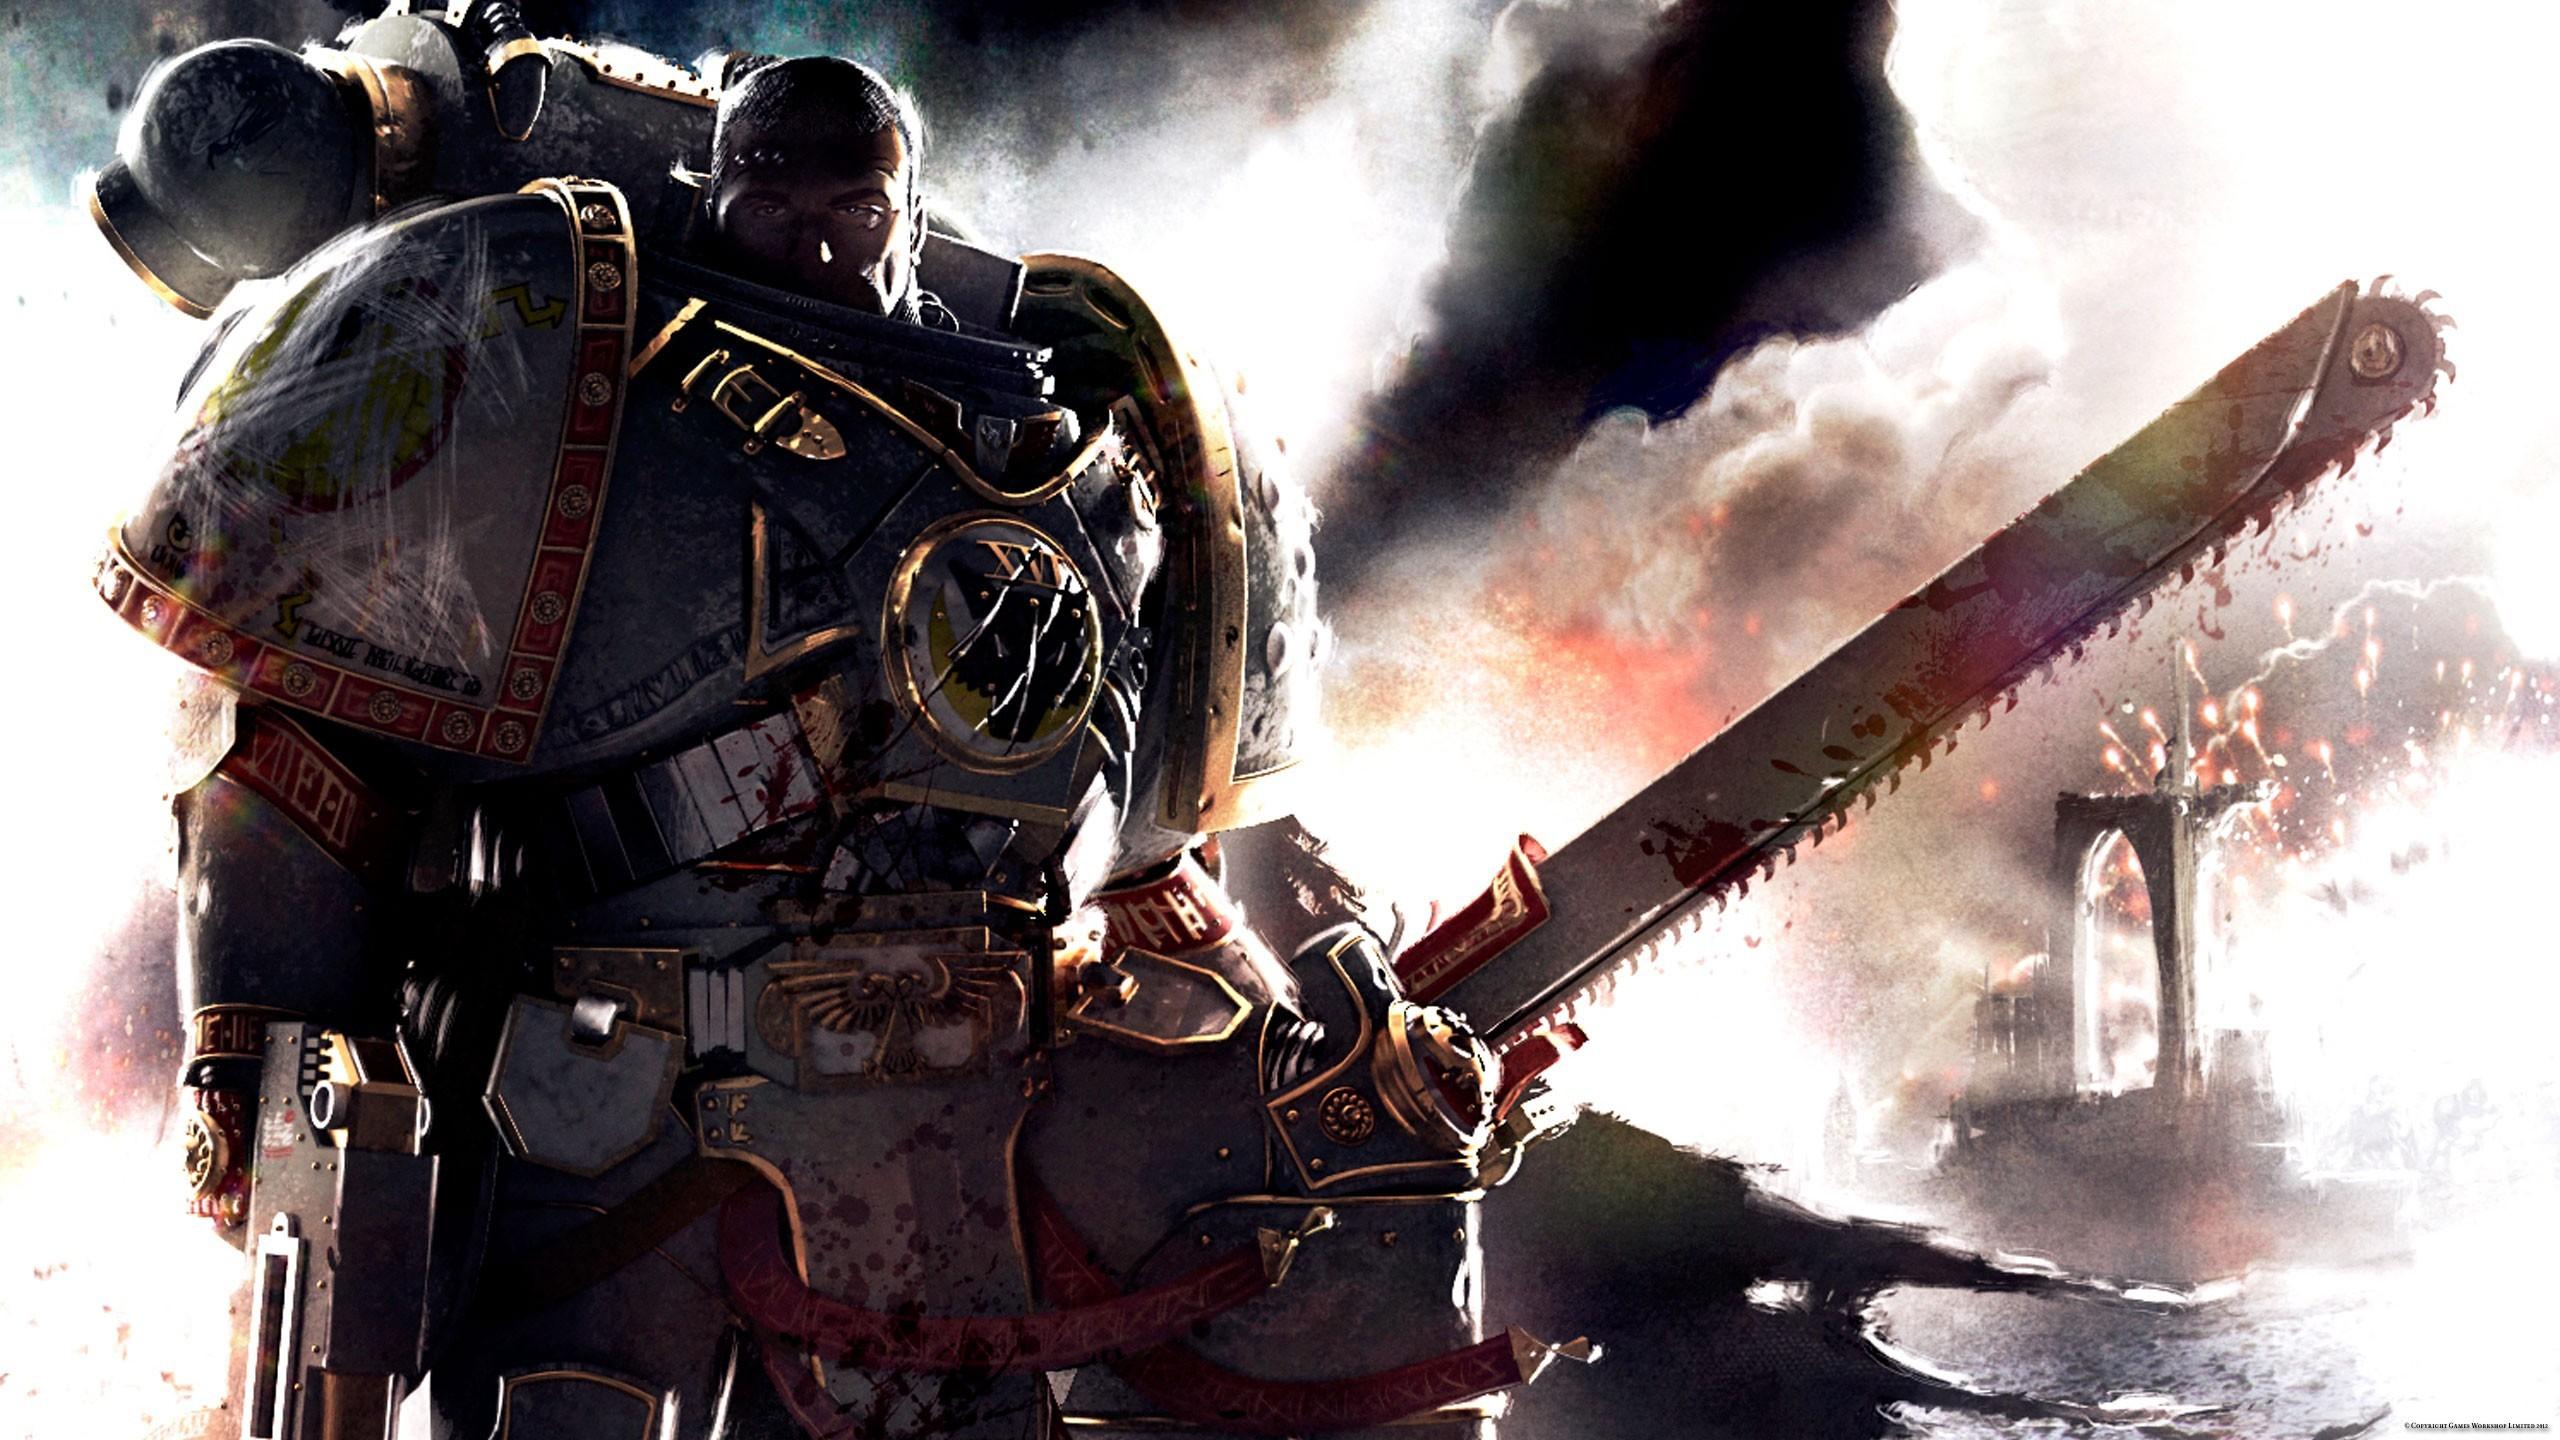 warhammer space marine 40000 w40k HD Wallpaper | space marines, exosuits,  future warfare | Pinterest | Space marine